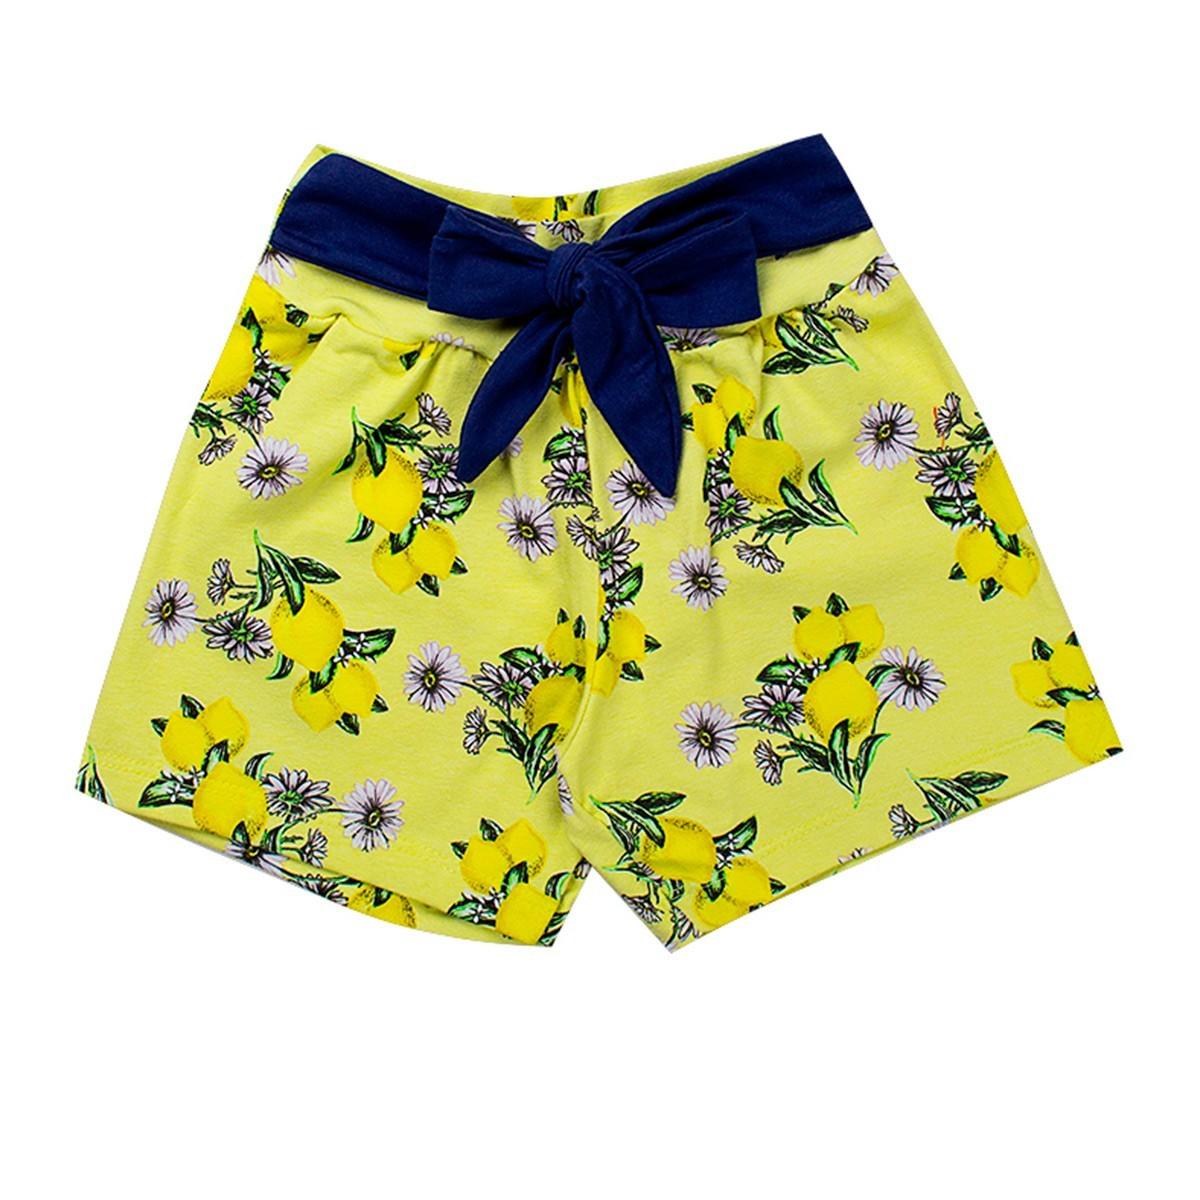 Shorts Infantil Menina Cotton Com Lacinho Amarelo Fantoni